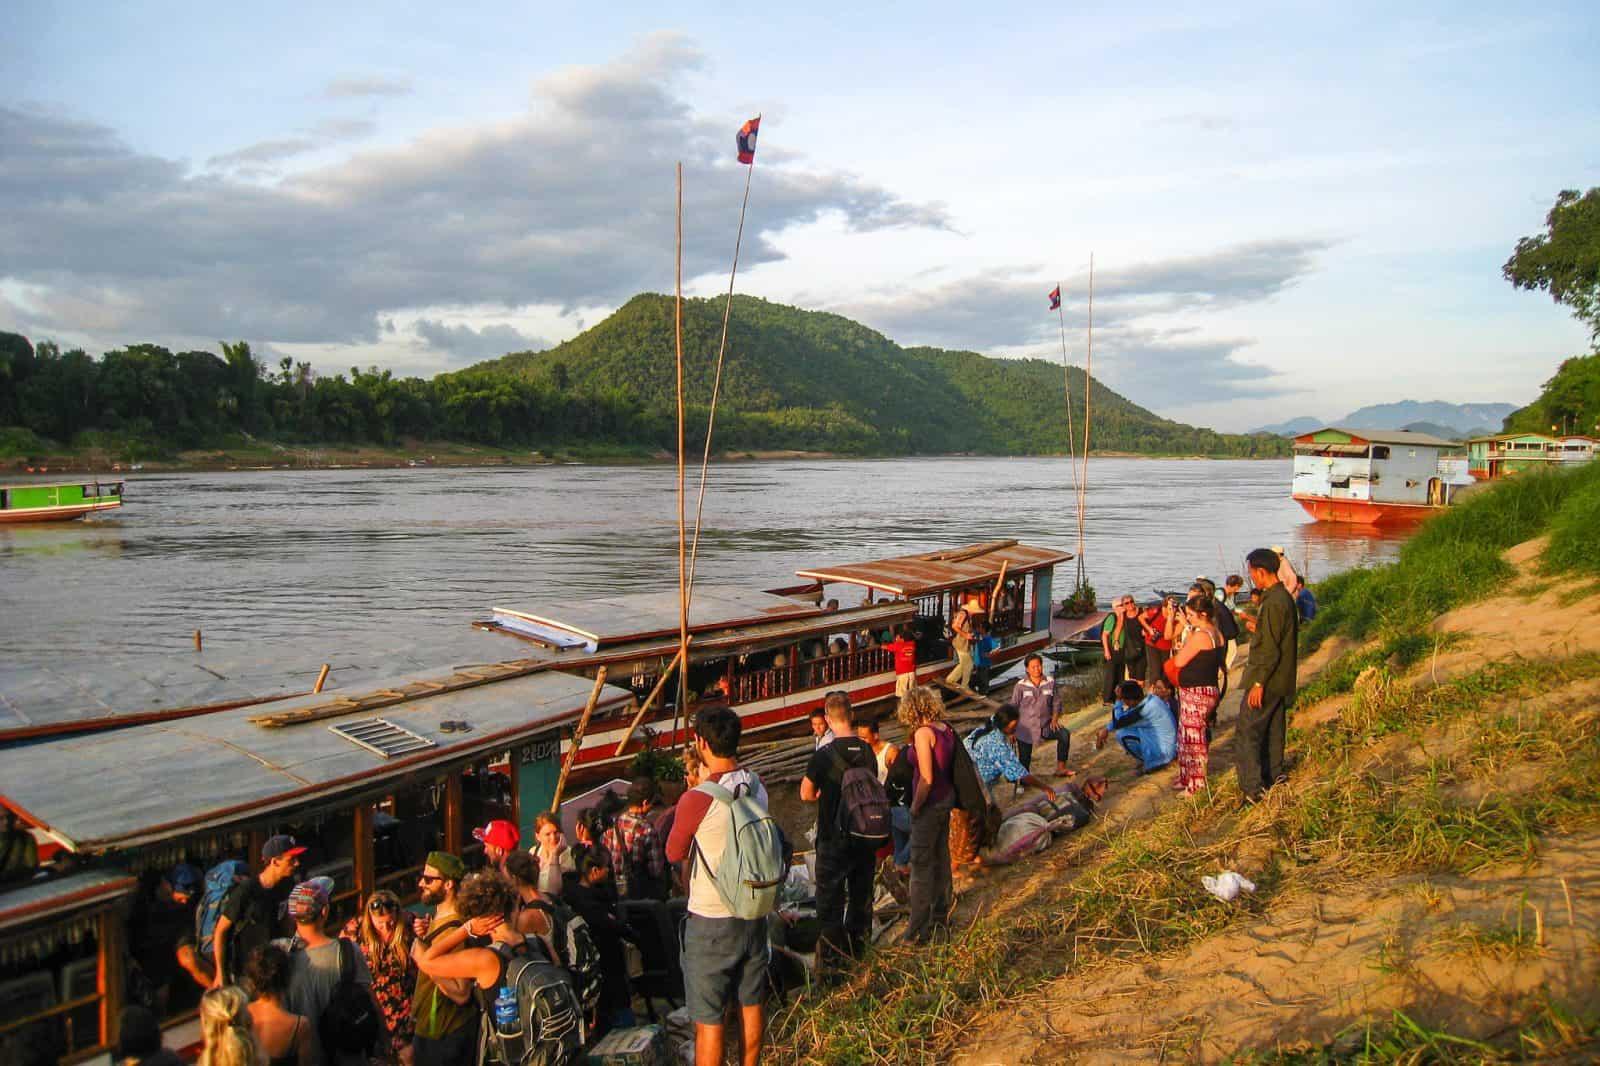 Arrival in Laos